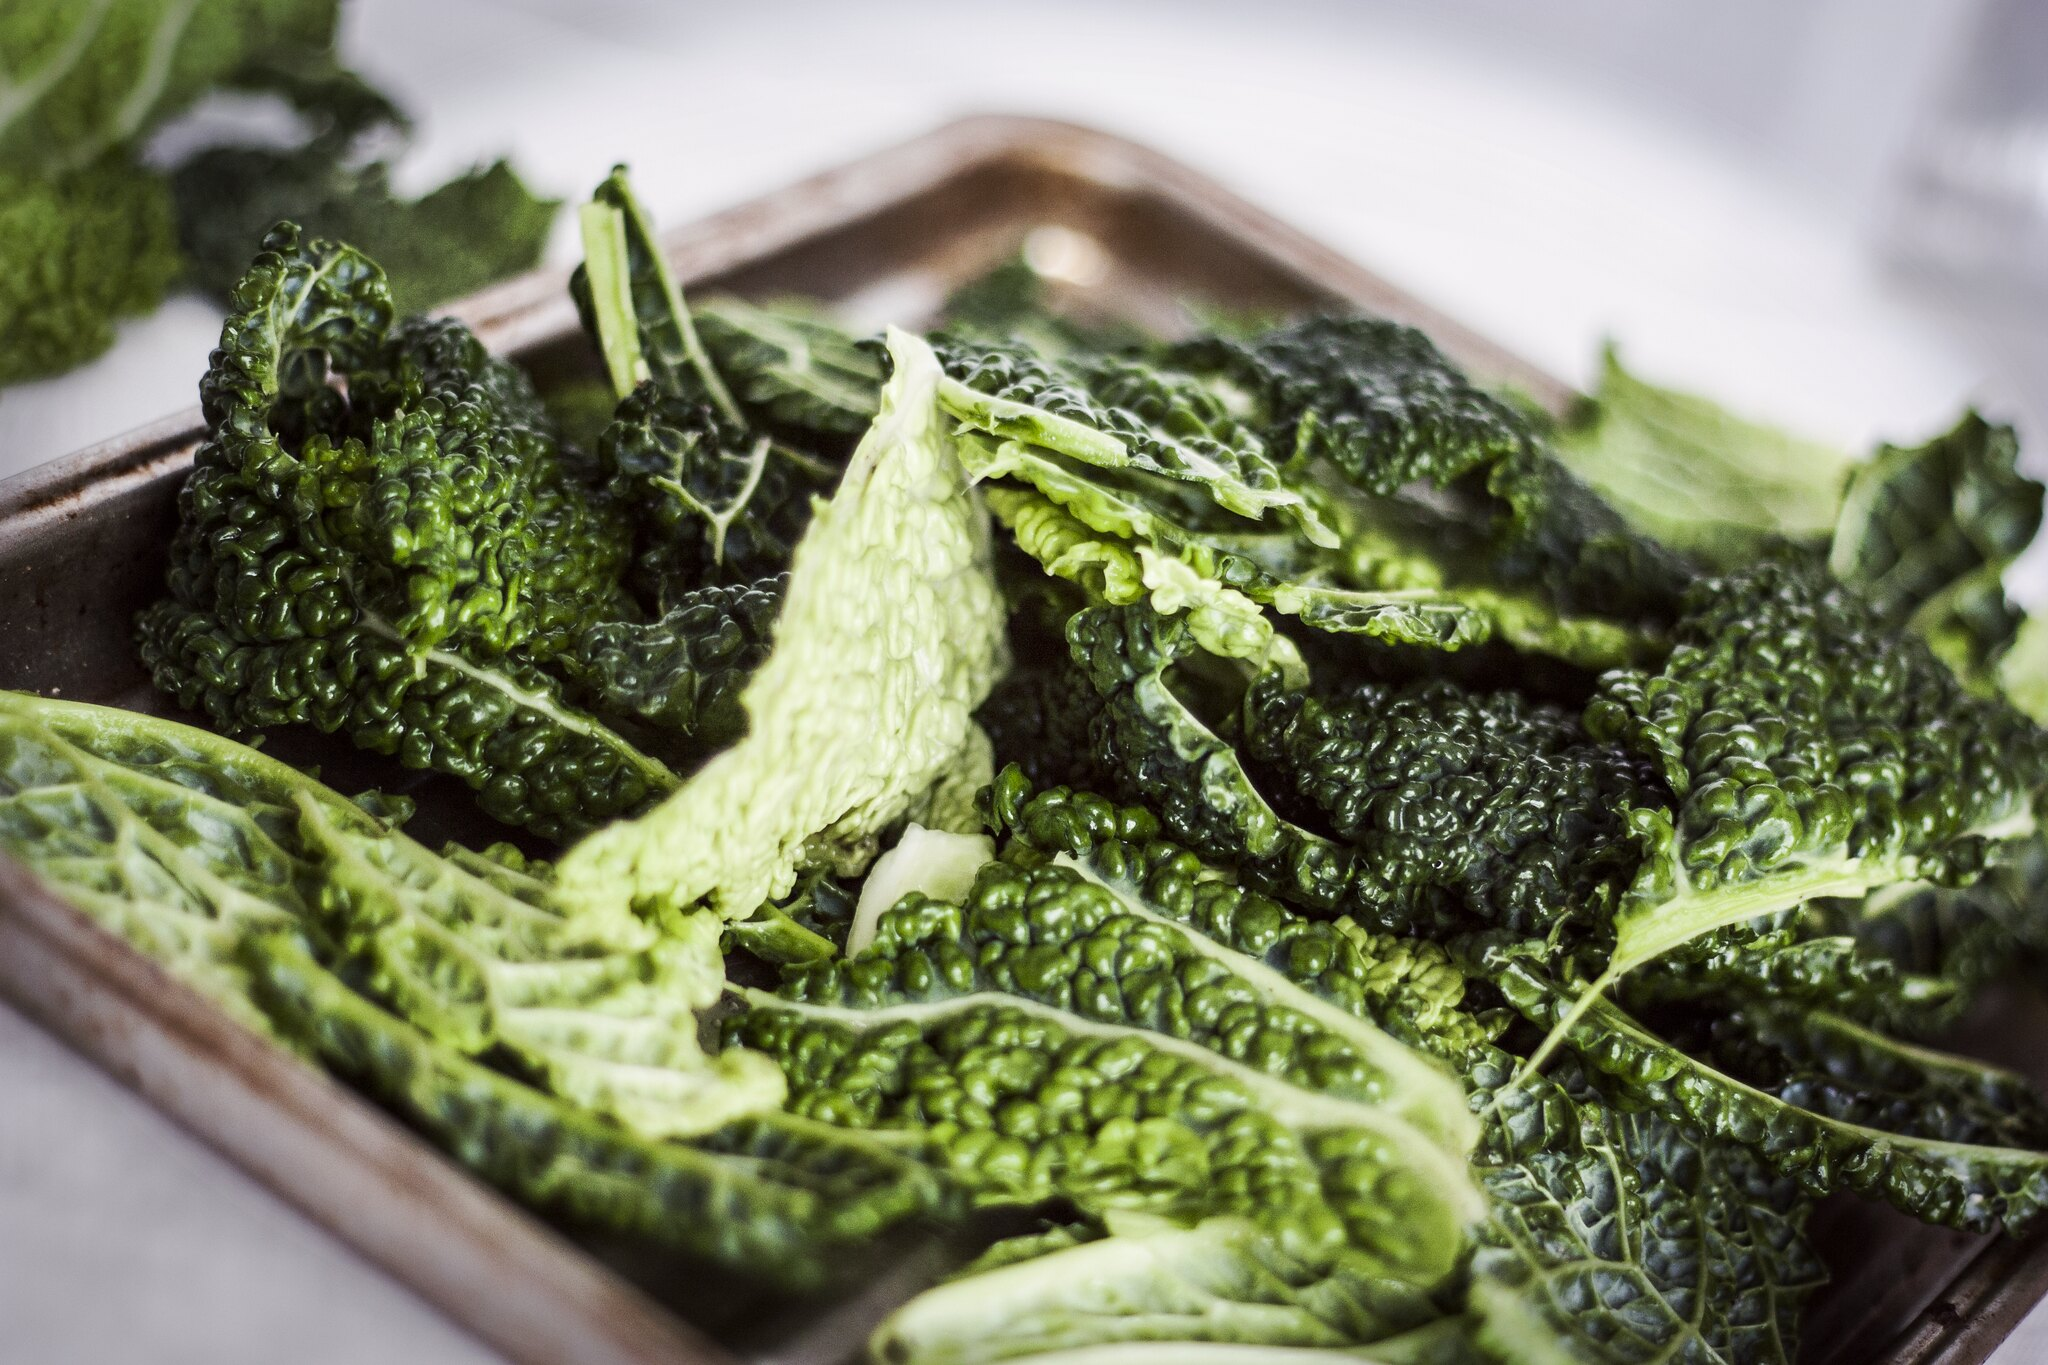 Green kale crisps